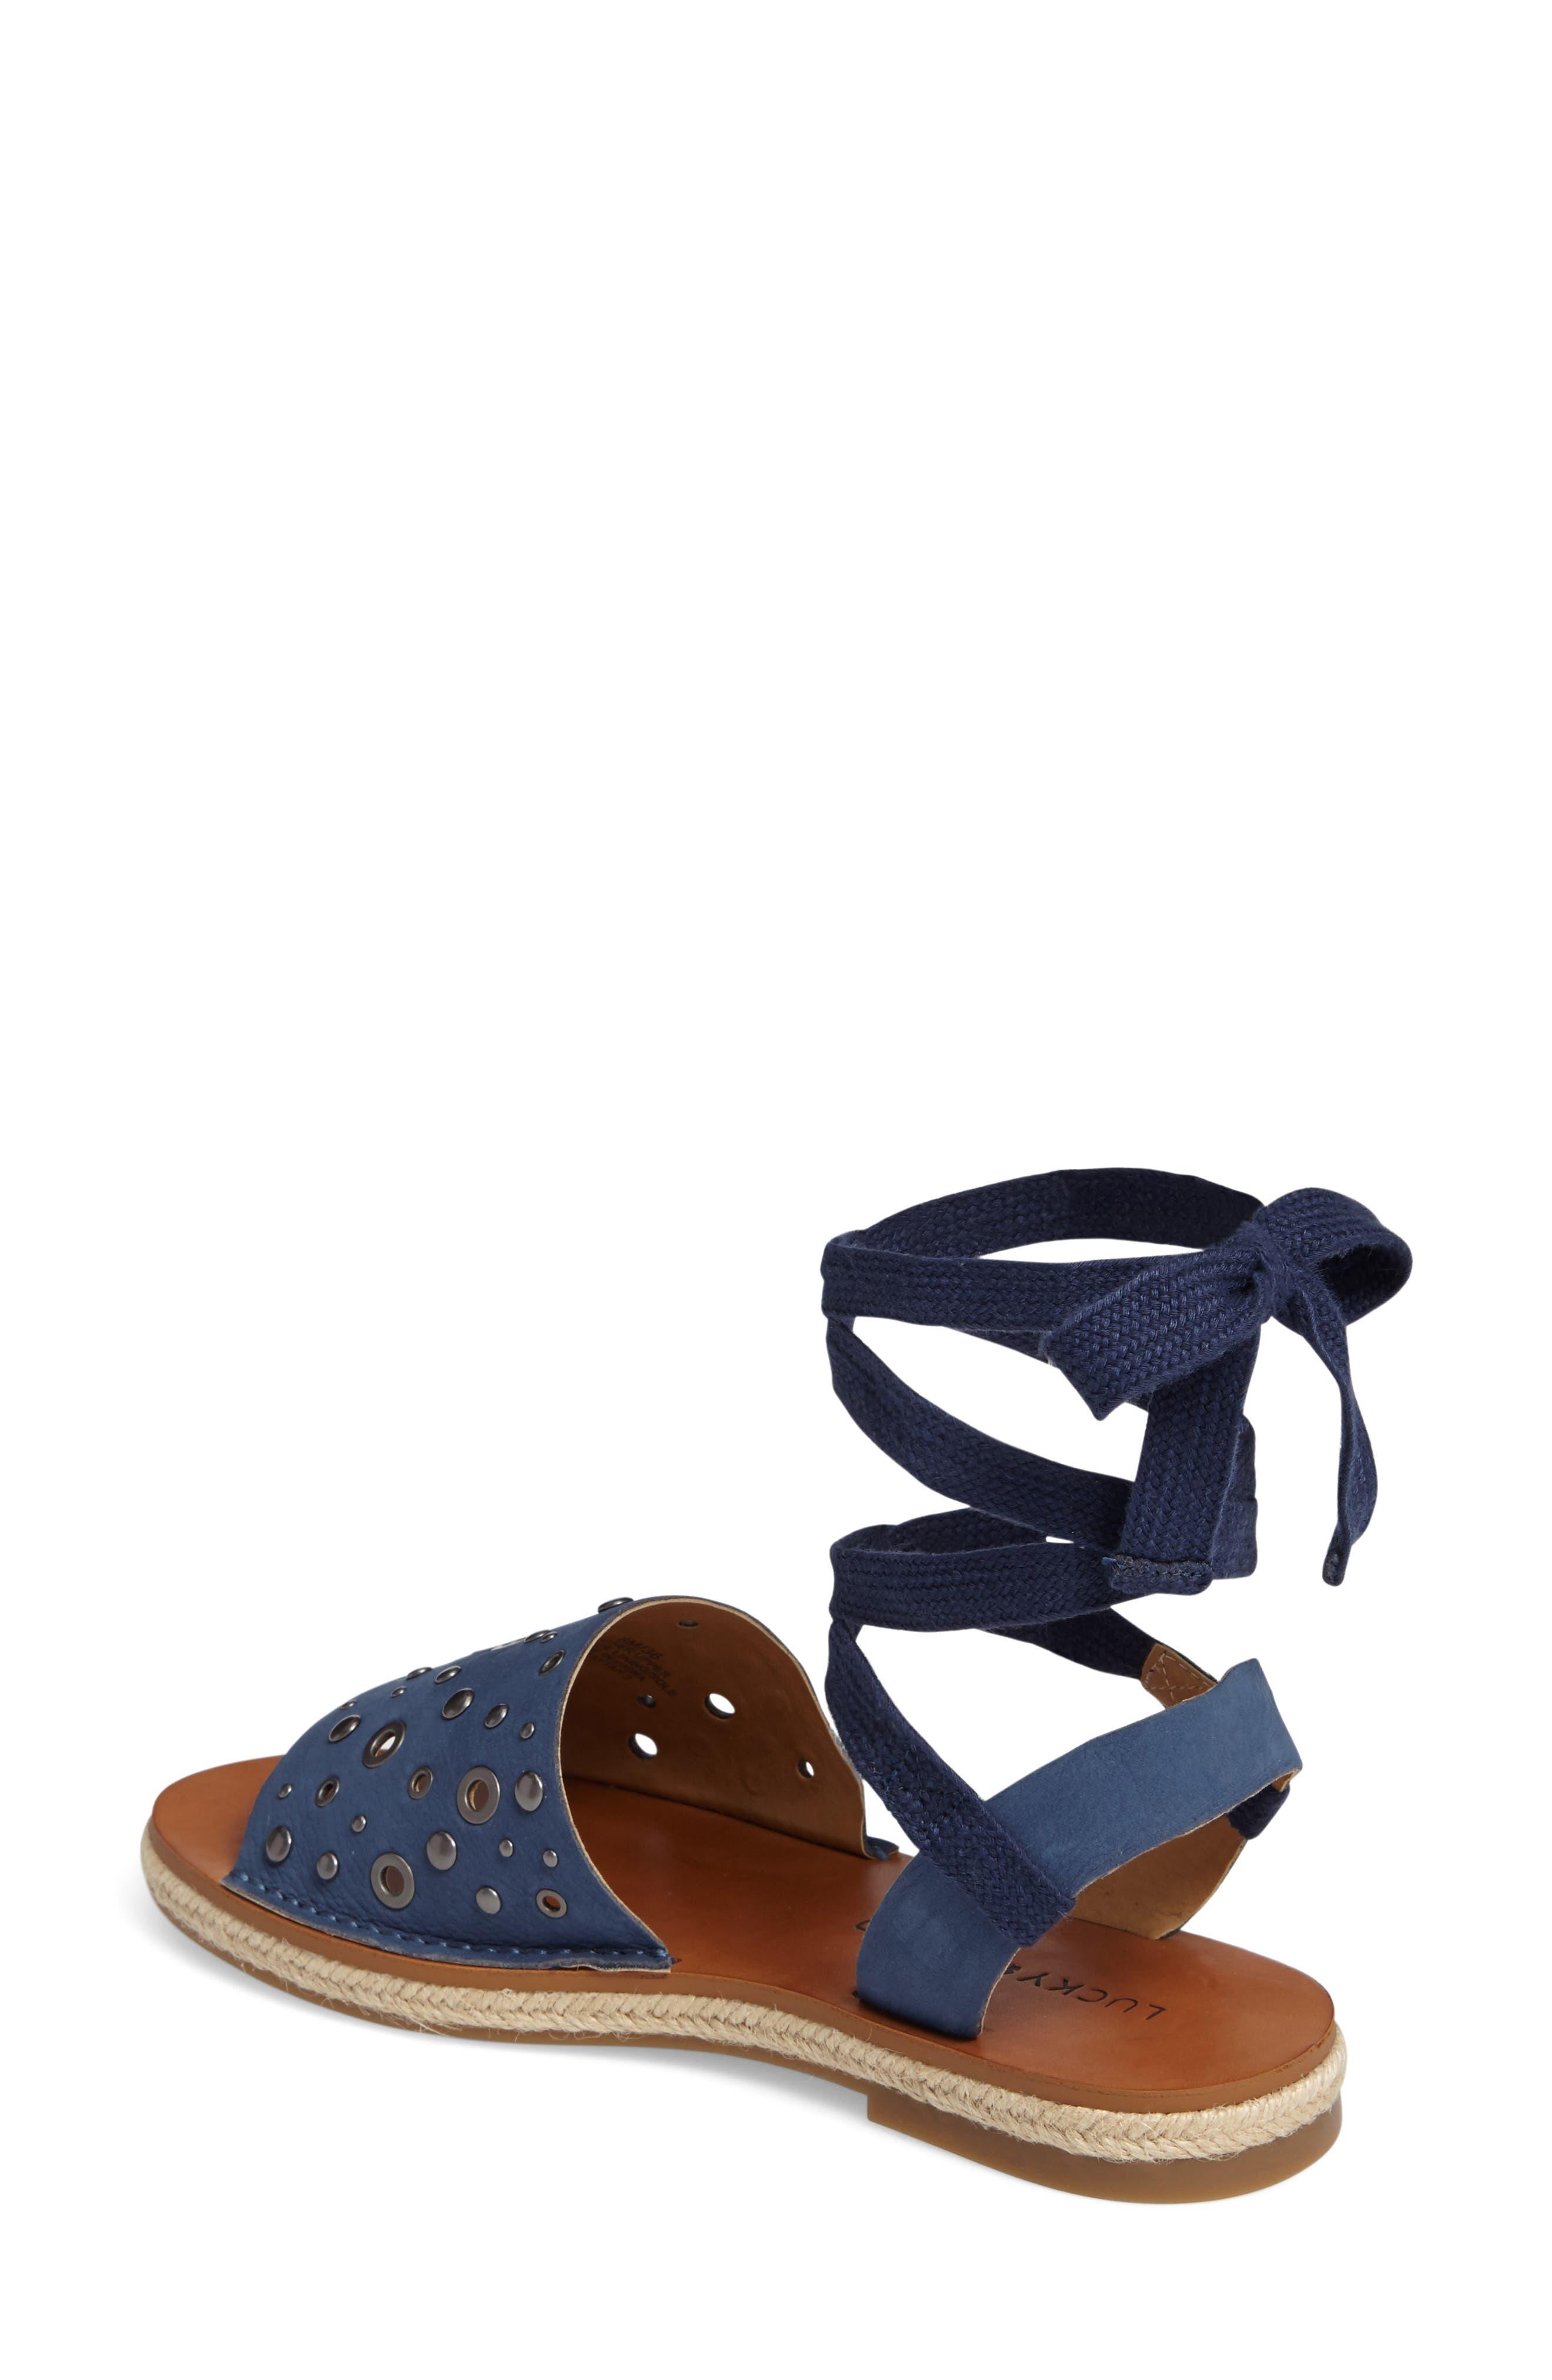 Daytah Ankle Tie Sandal,                             Alternate thumbnail 8, color,